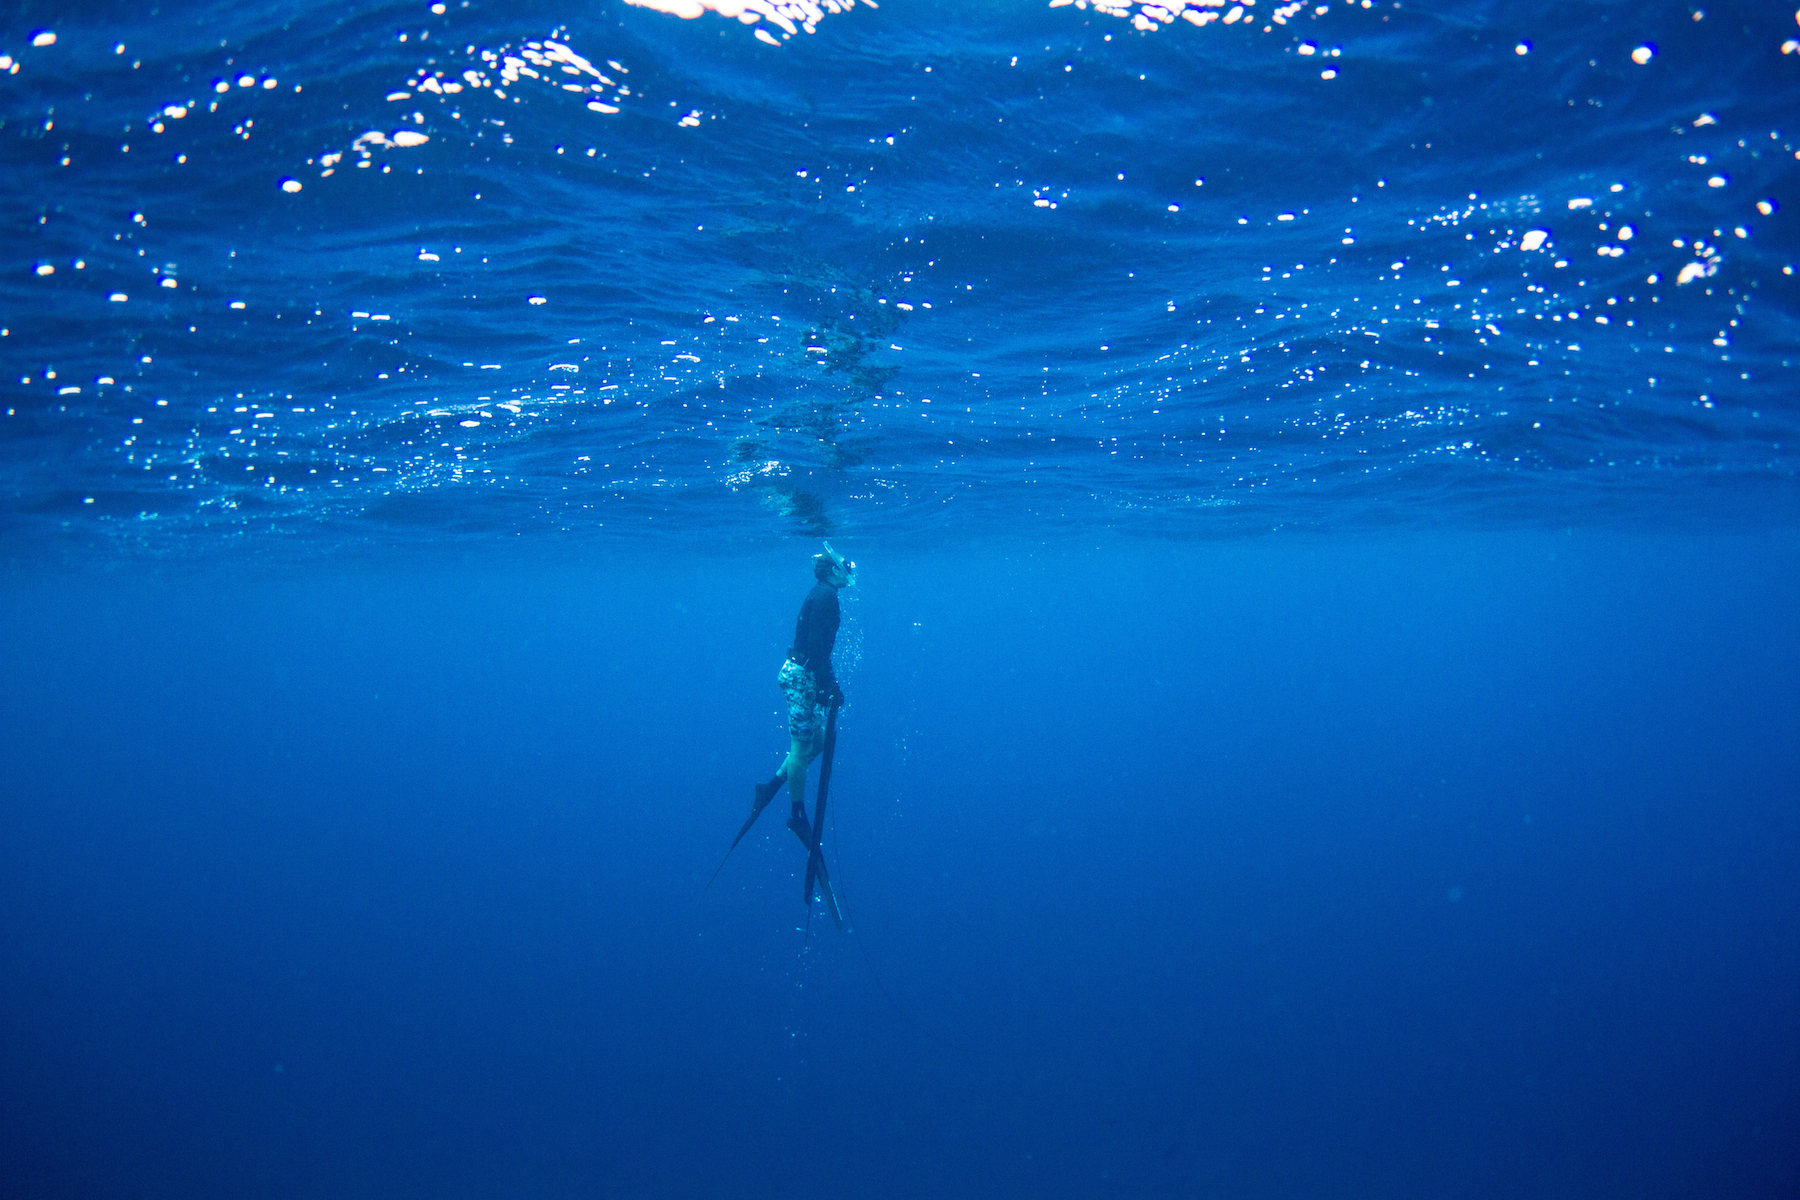 sumatra, telo islands, spear fishing, rlz, latitude zero, surf resort, mangalui